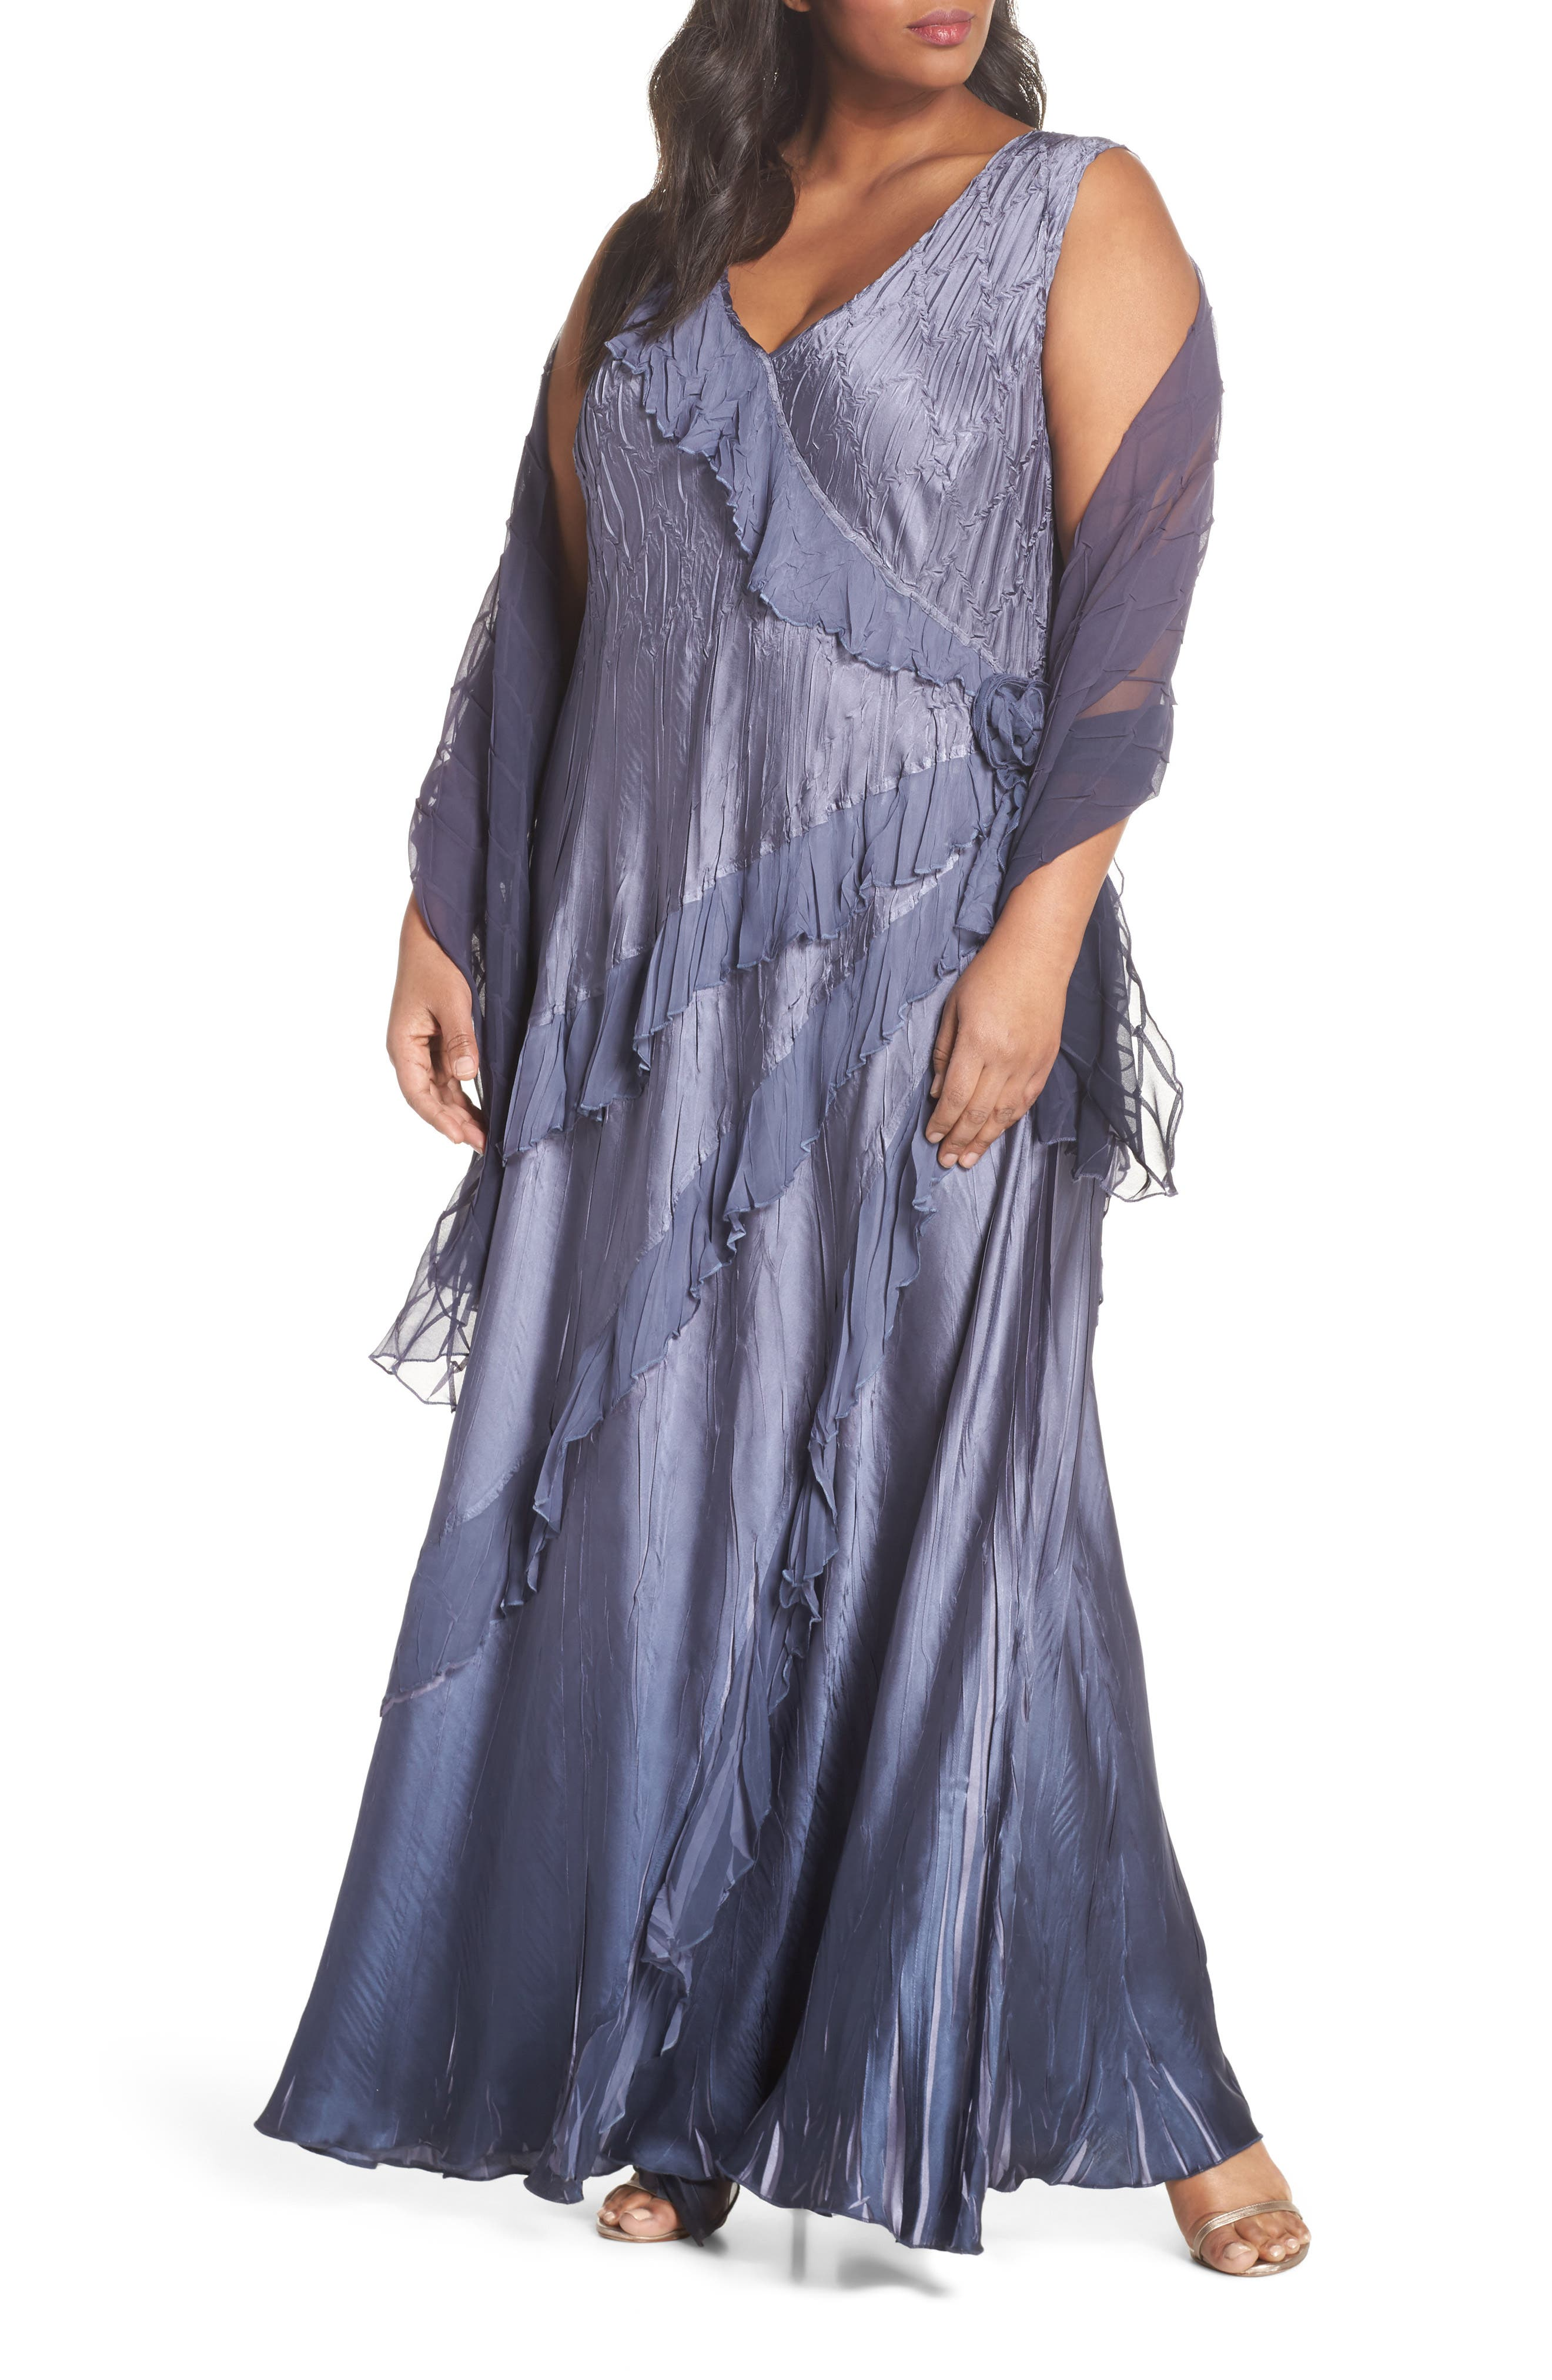 Komarov Ruffle Charmeuse Gown with Wrap